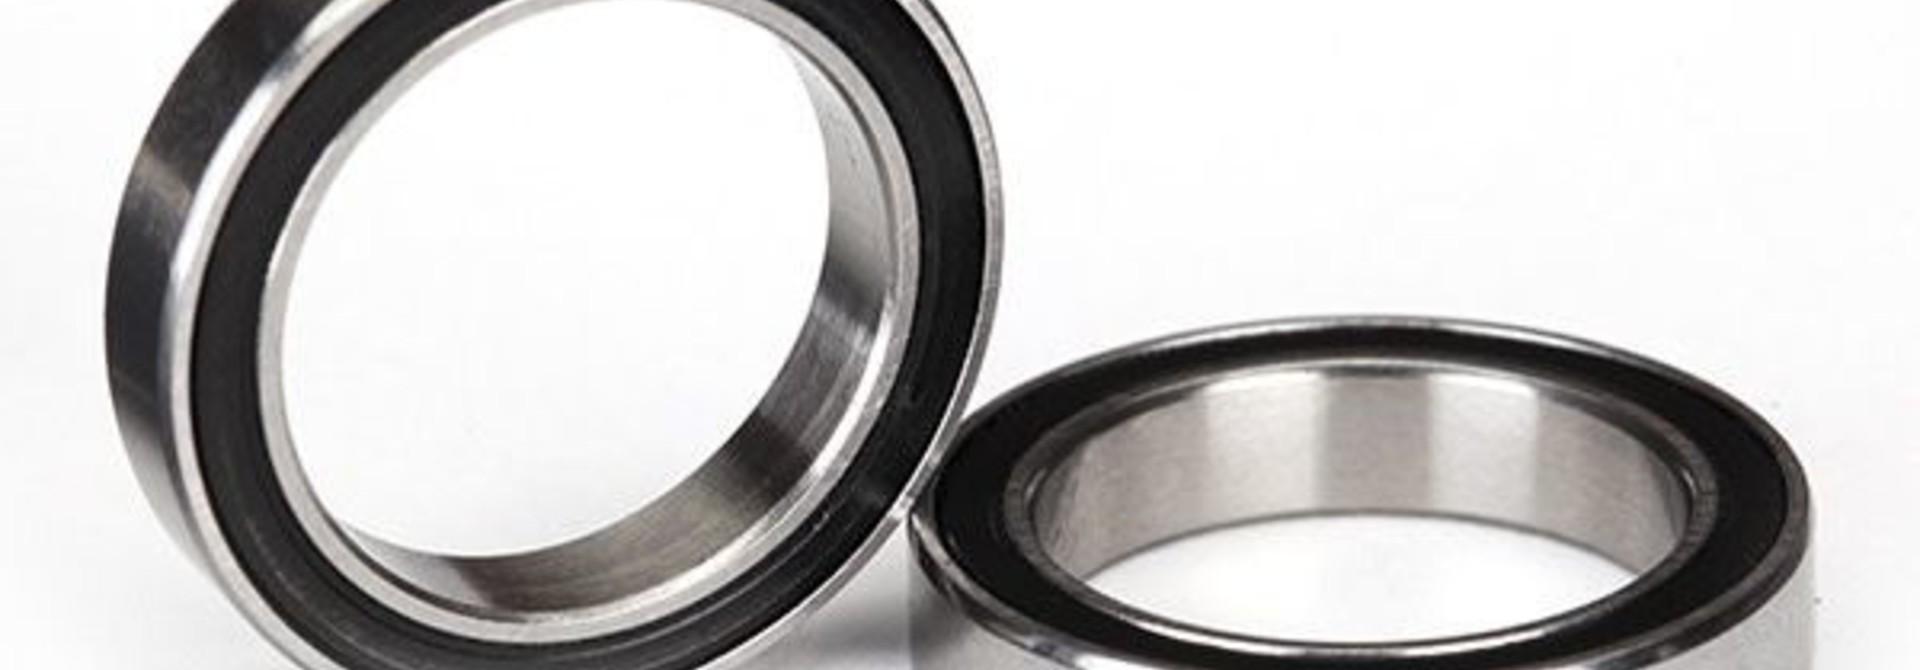 Ball bearings, black rubber sealed (15x21x4mm) (2), TRX5102A